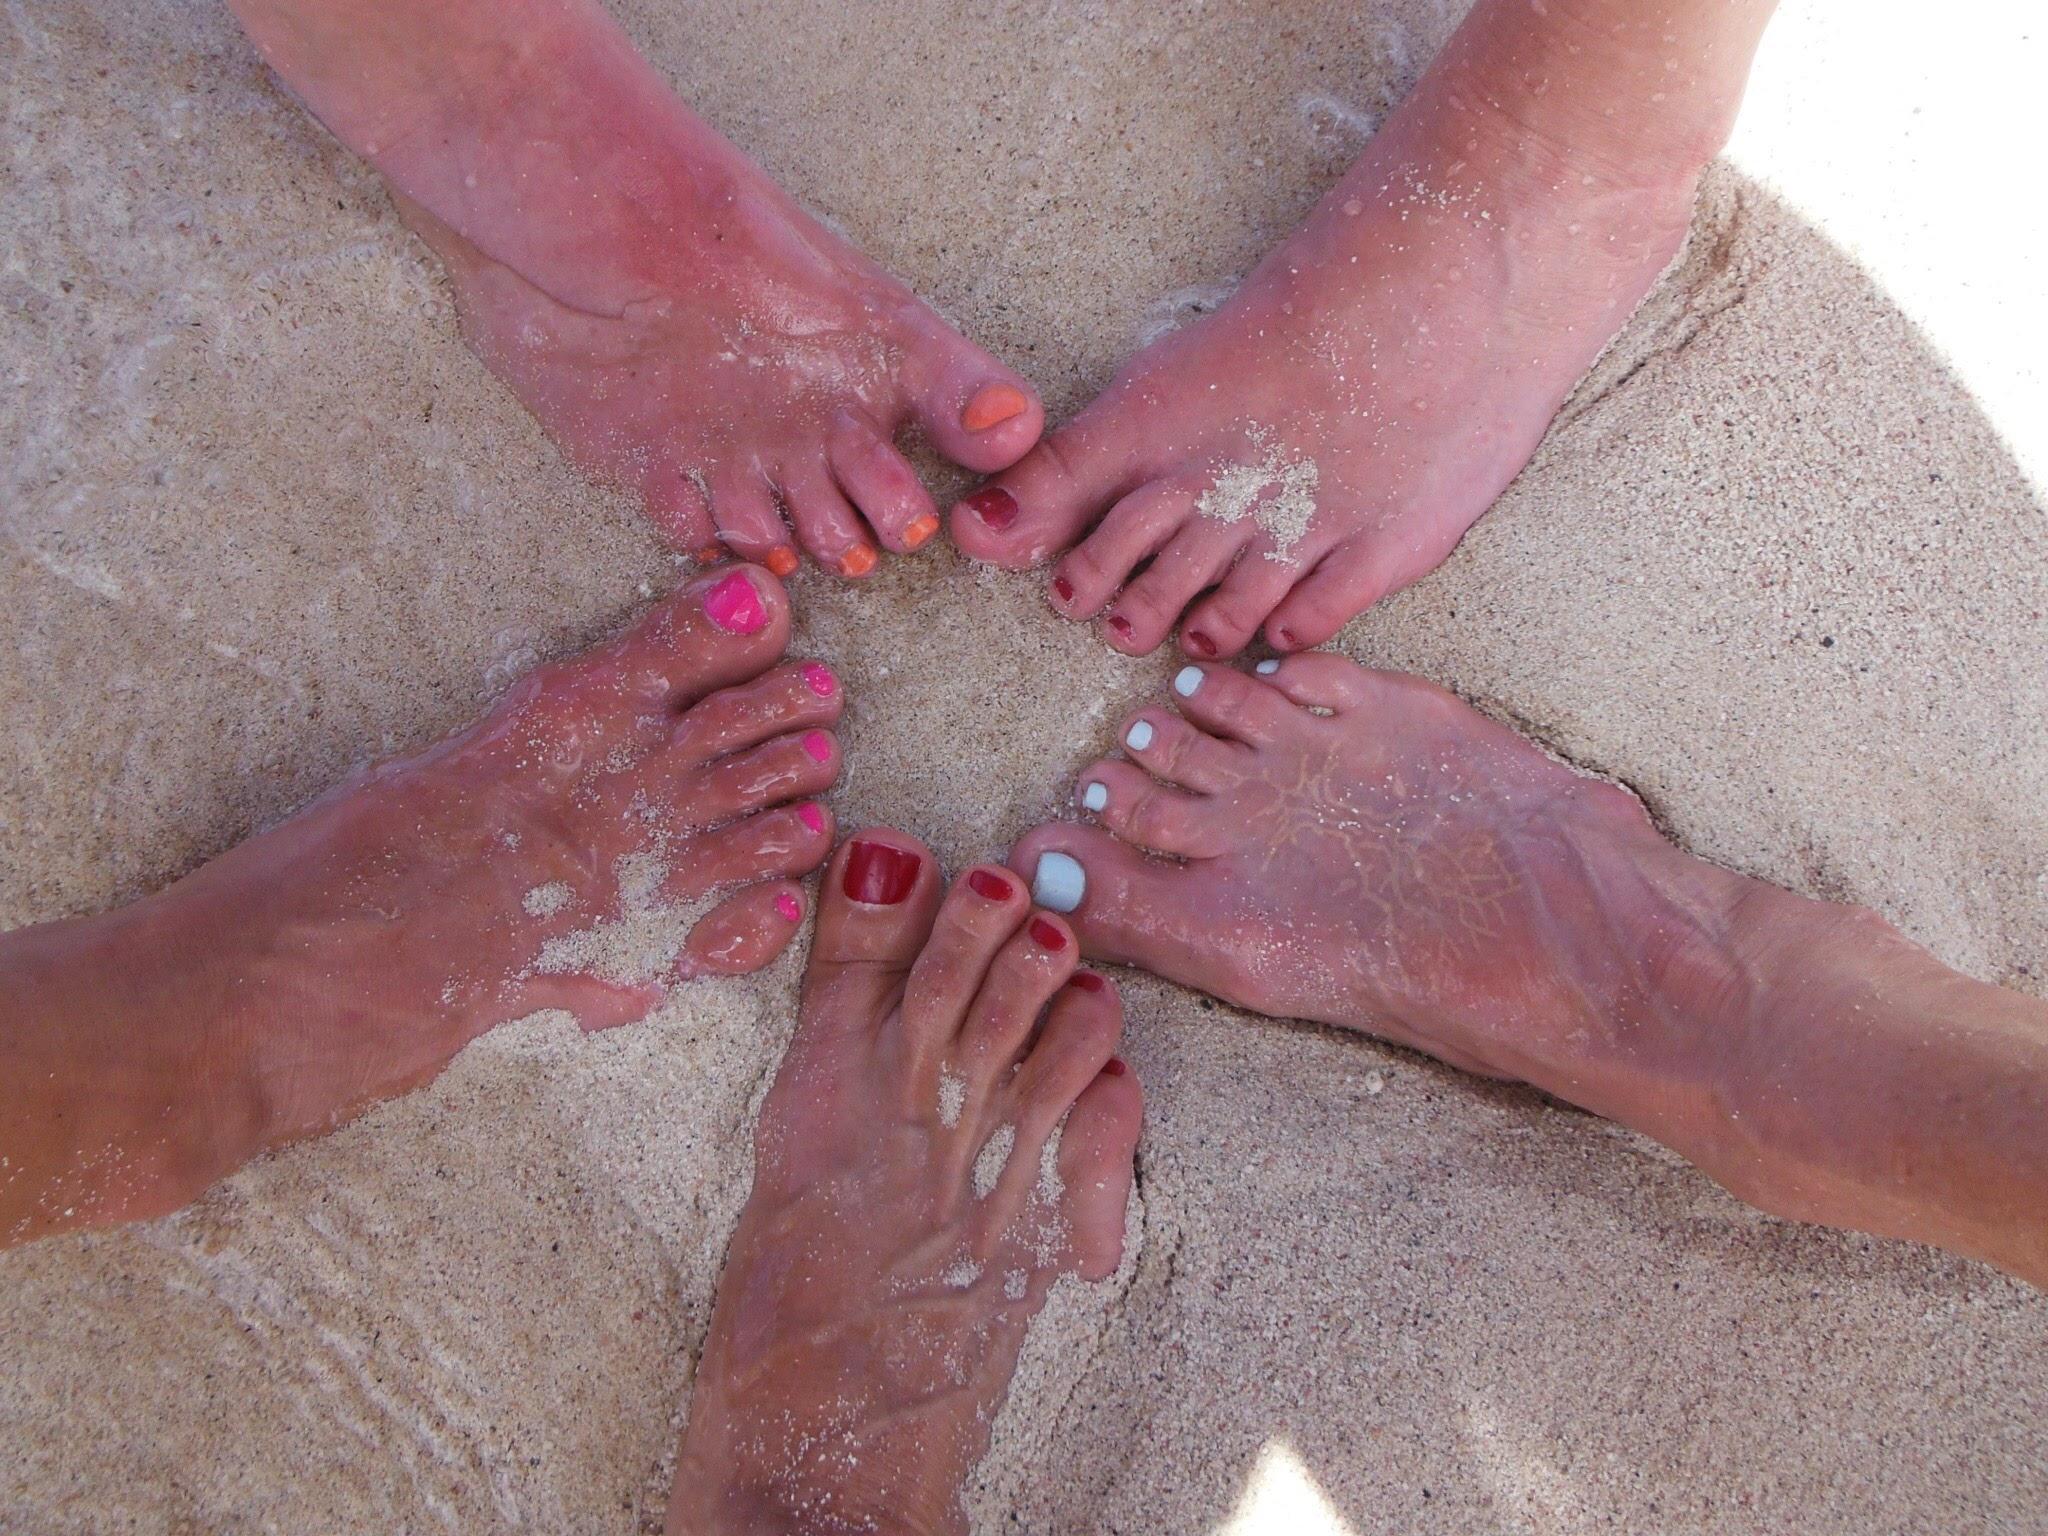 Feet on the Beach - St. Martin - 55 by 55 Travel